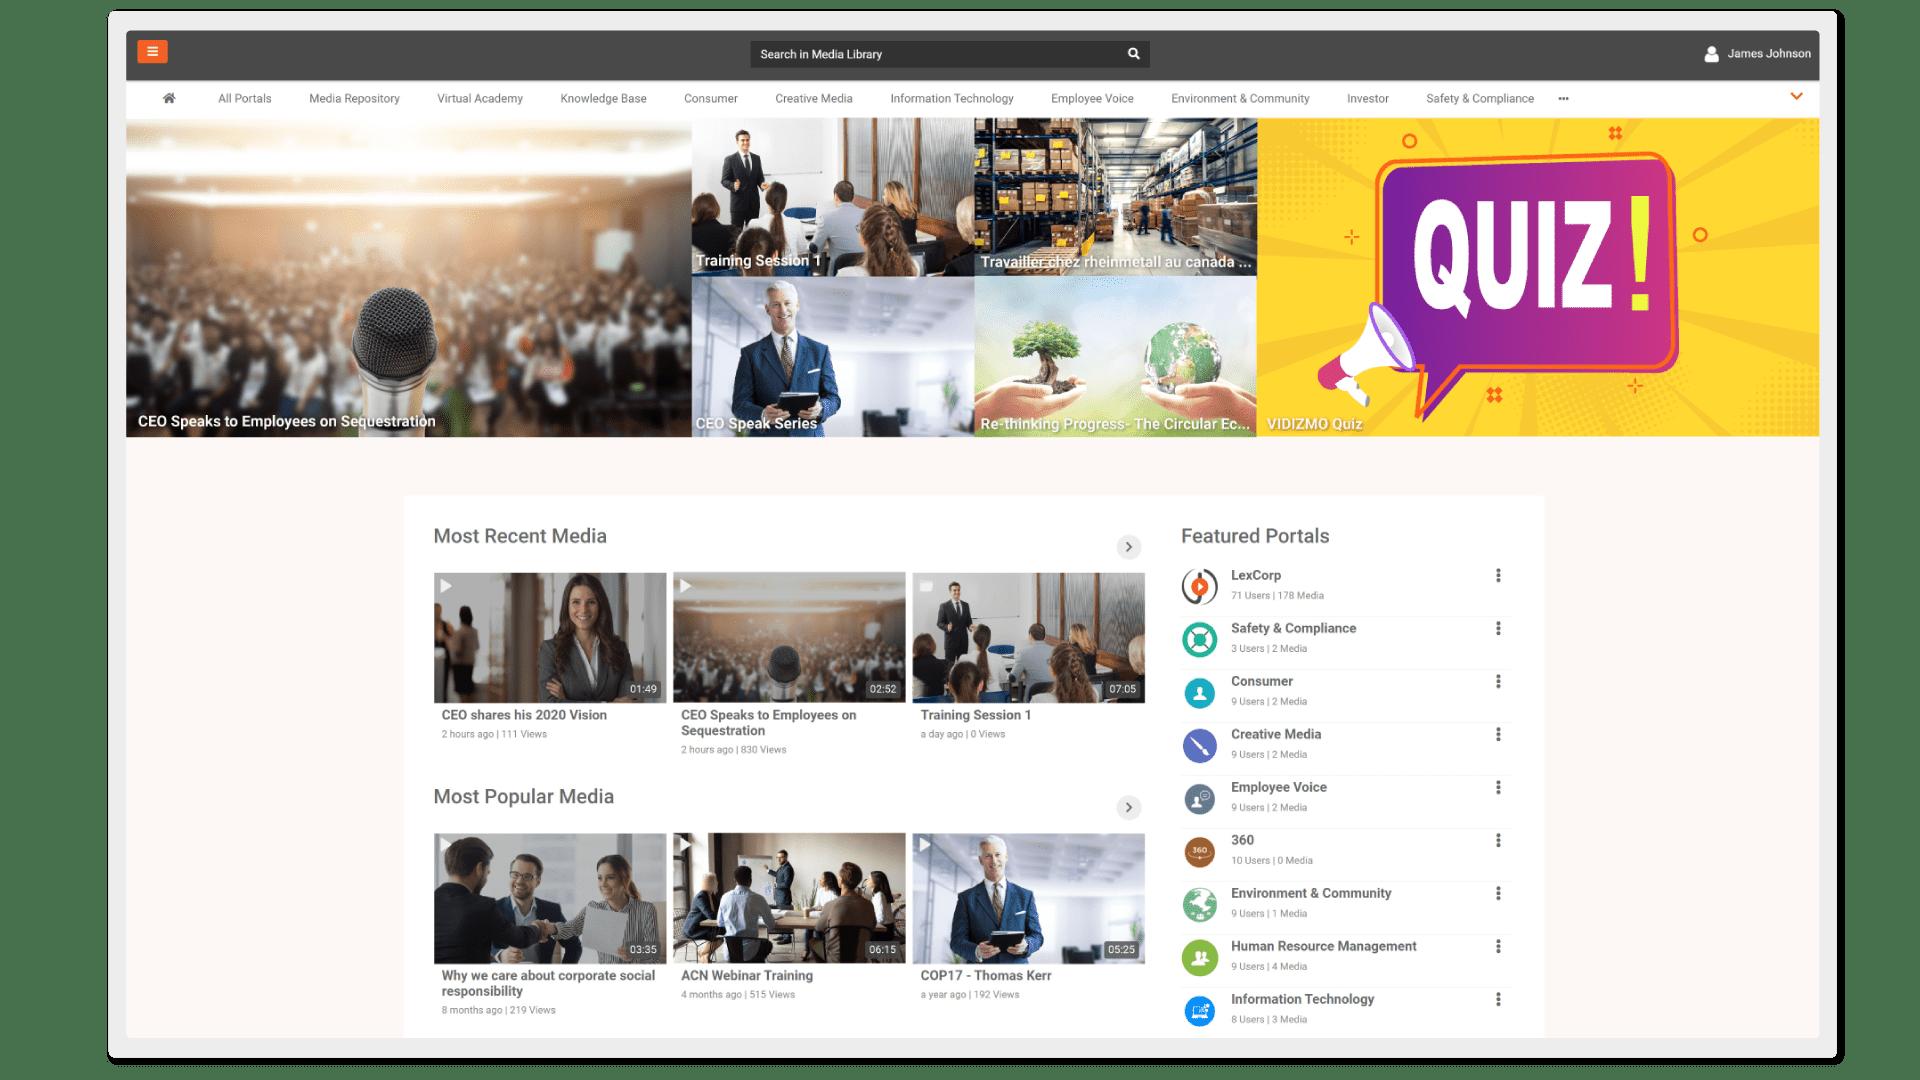 VIDIZMO brandable end-to-end enterprise video platform